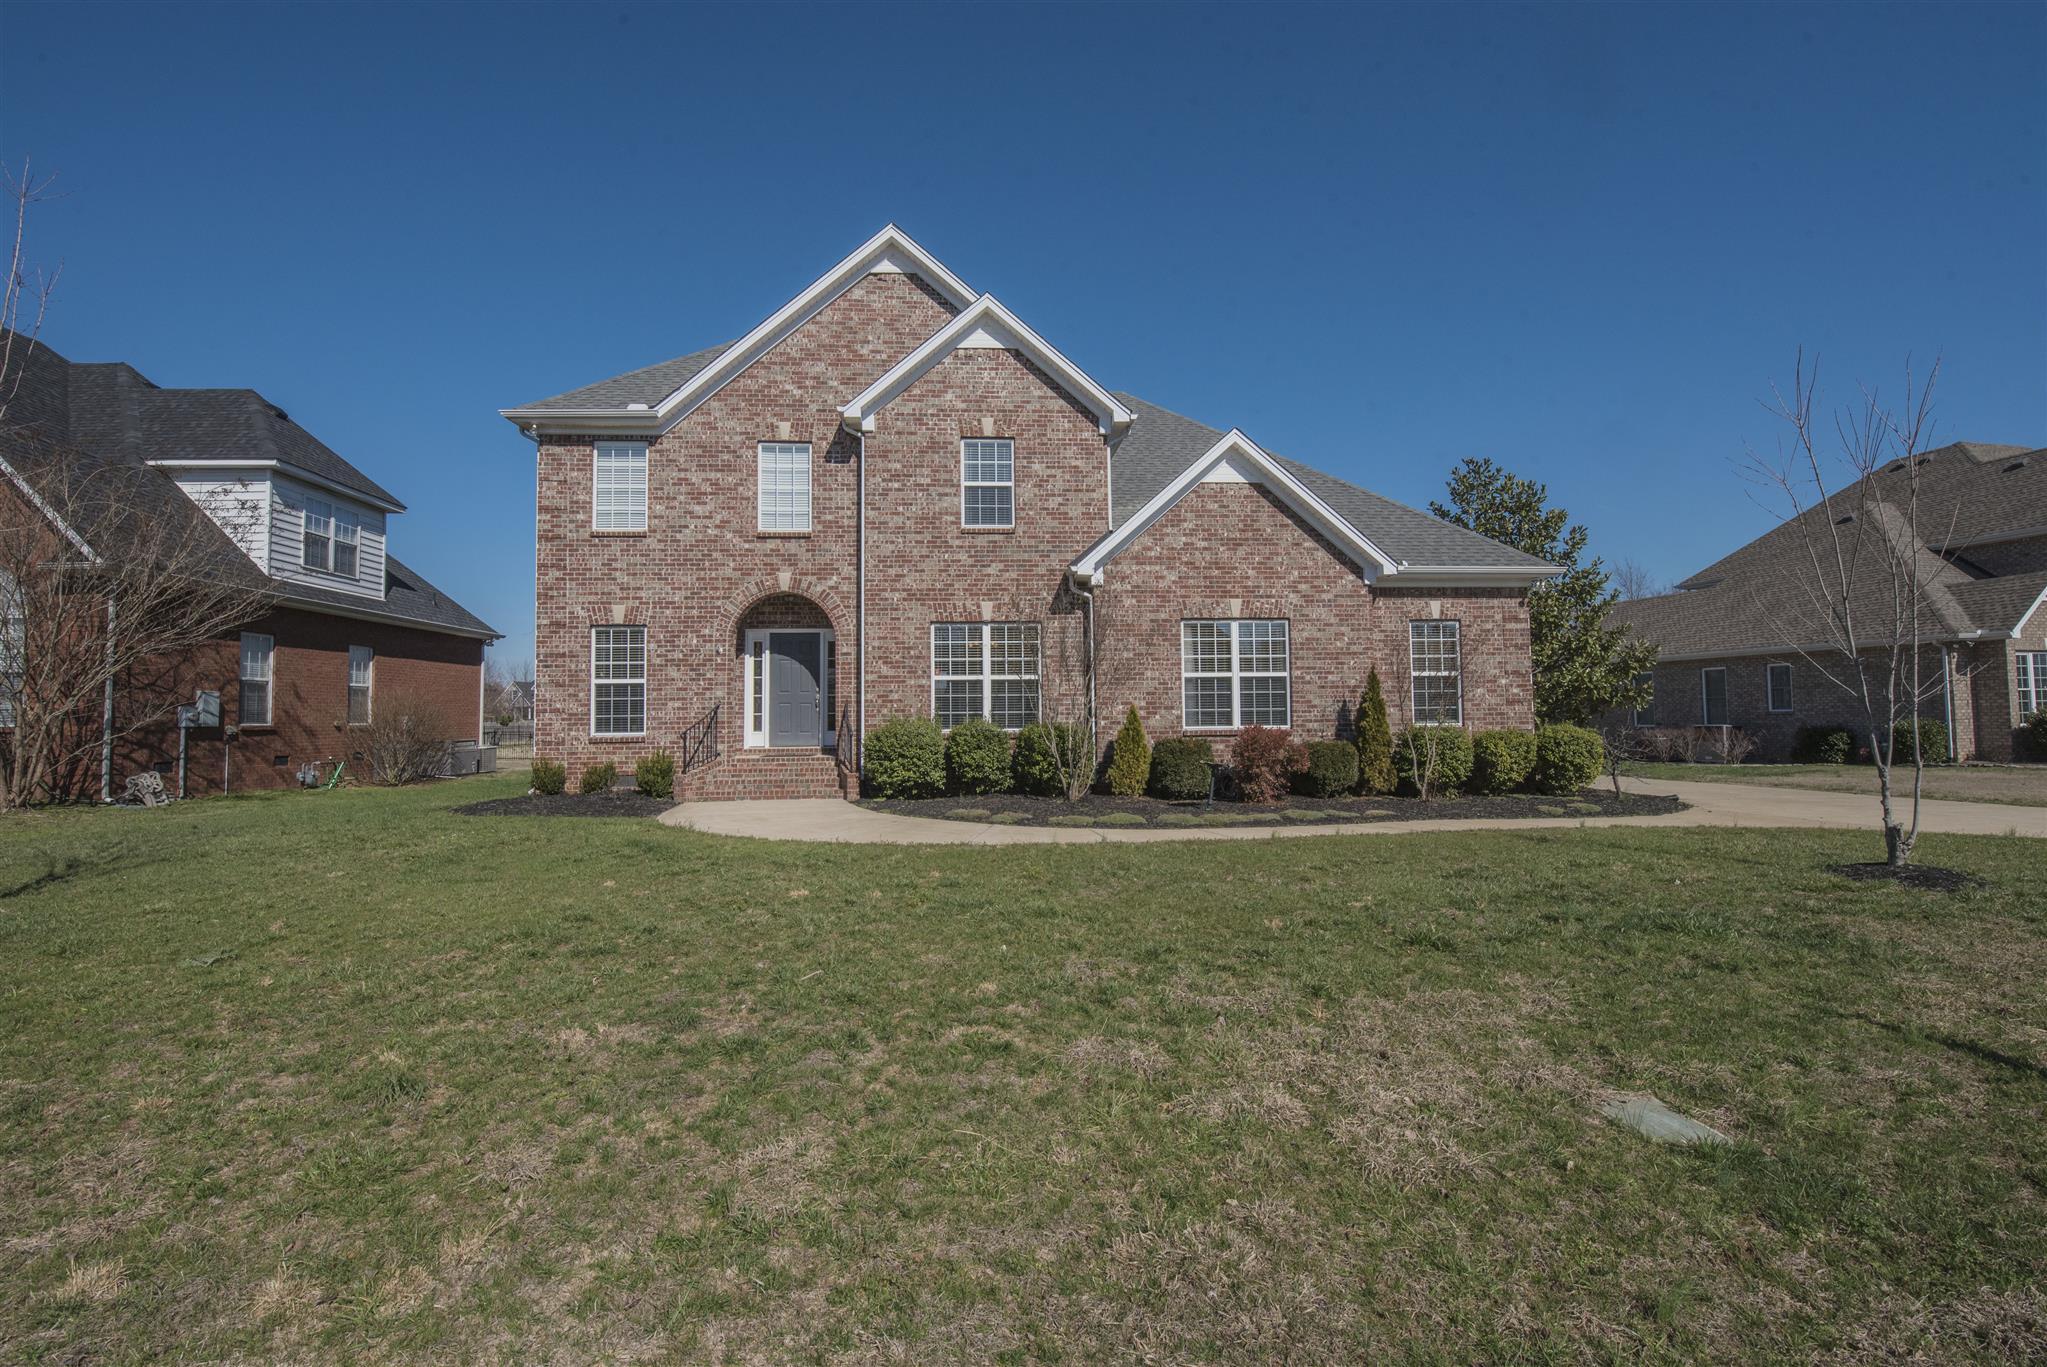 531 Savannah Rdg, Murfreesboro, TN 37127